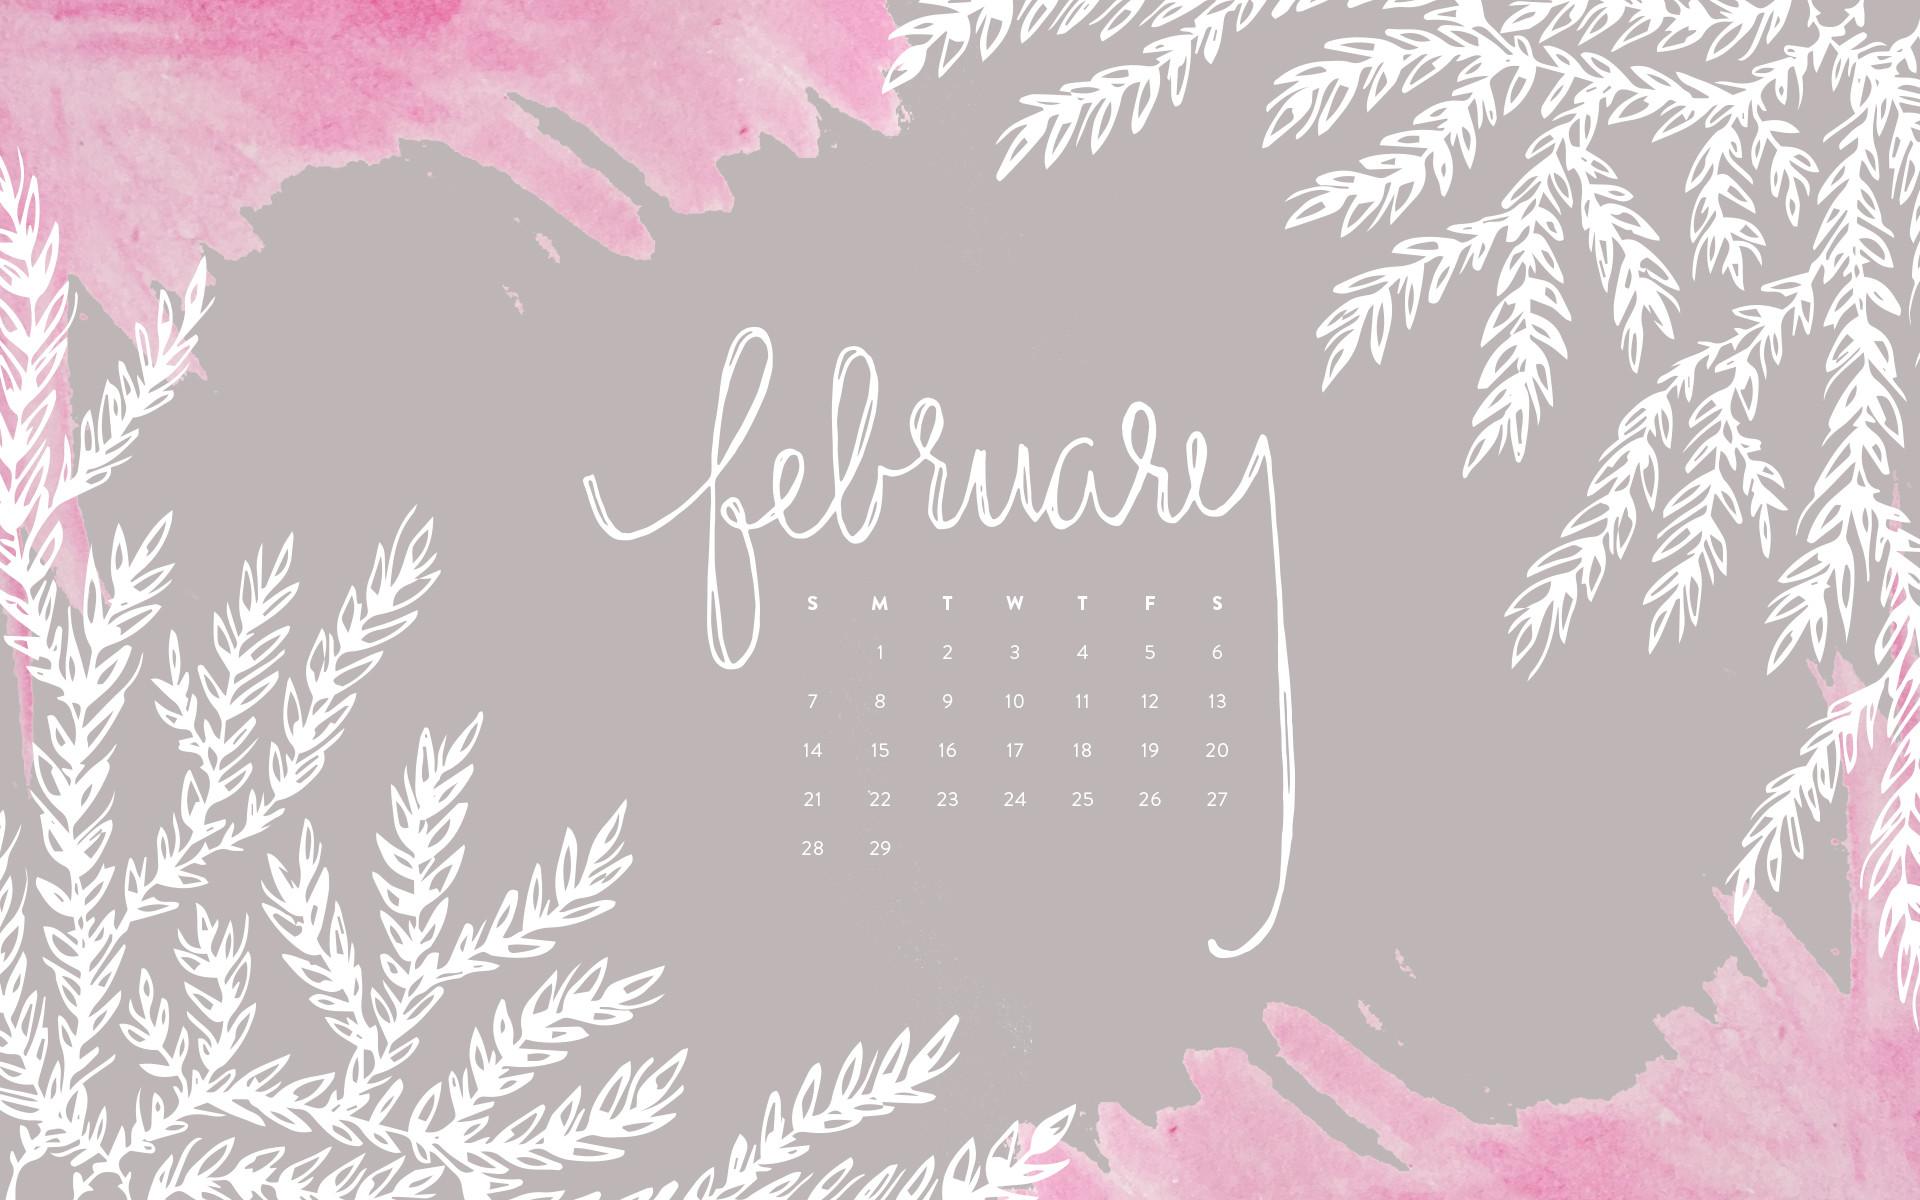 February 2018 Wallpaper Calendar 63 images 1920x1200